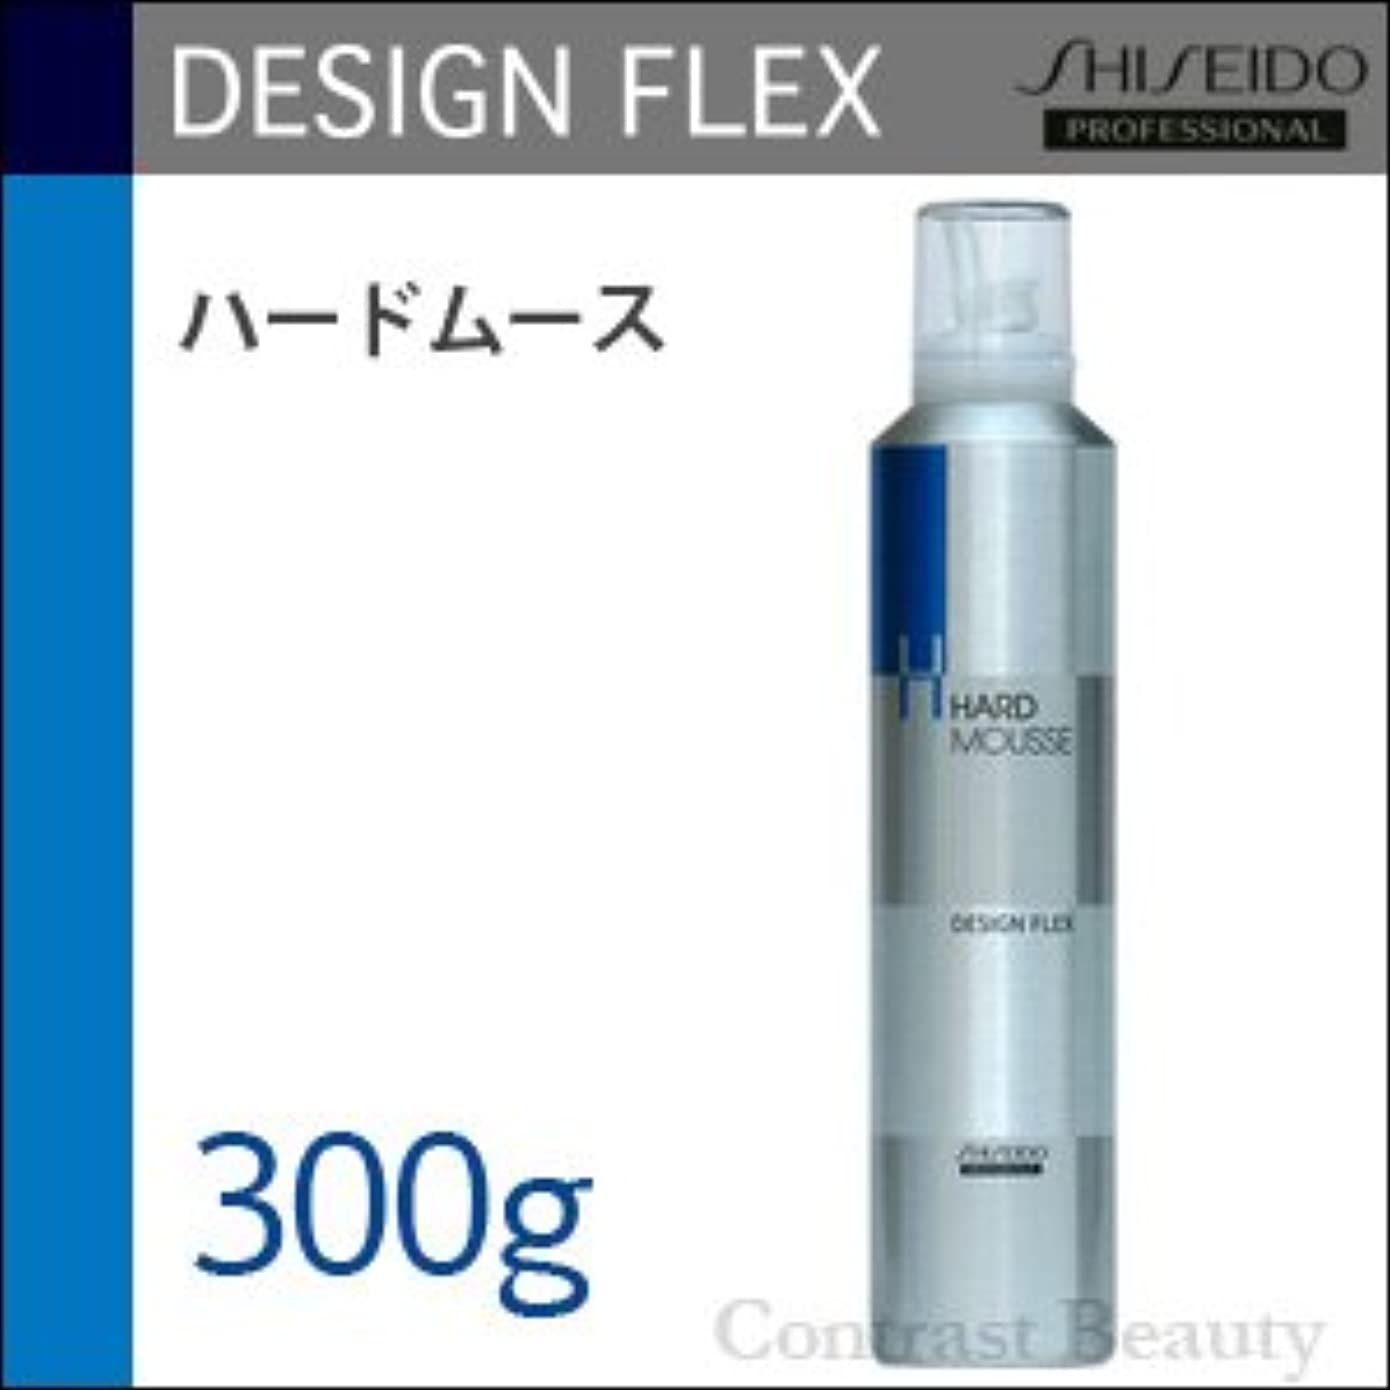 【x3個セット】 資生堂 デザインフレックス ハードムース 300g